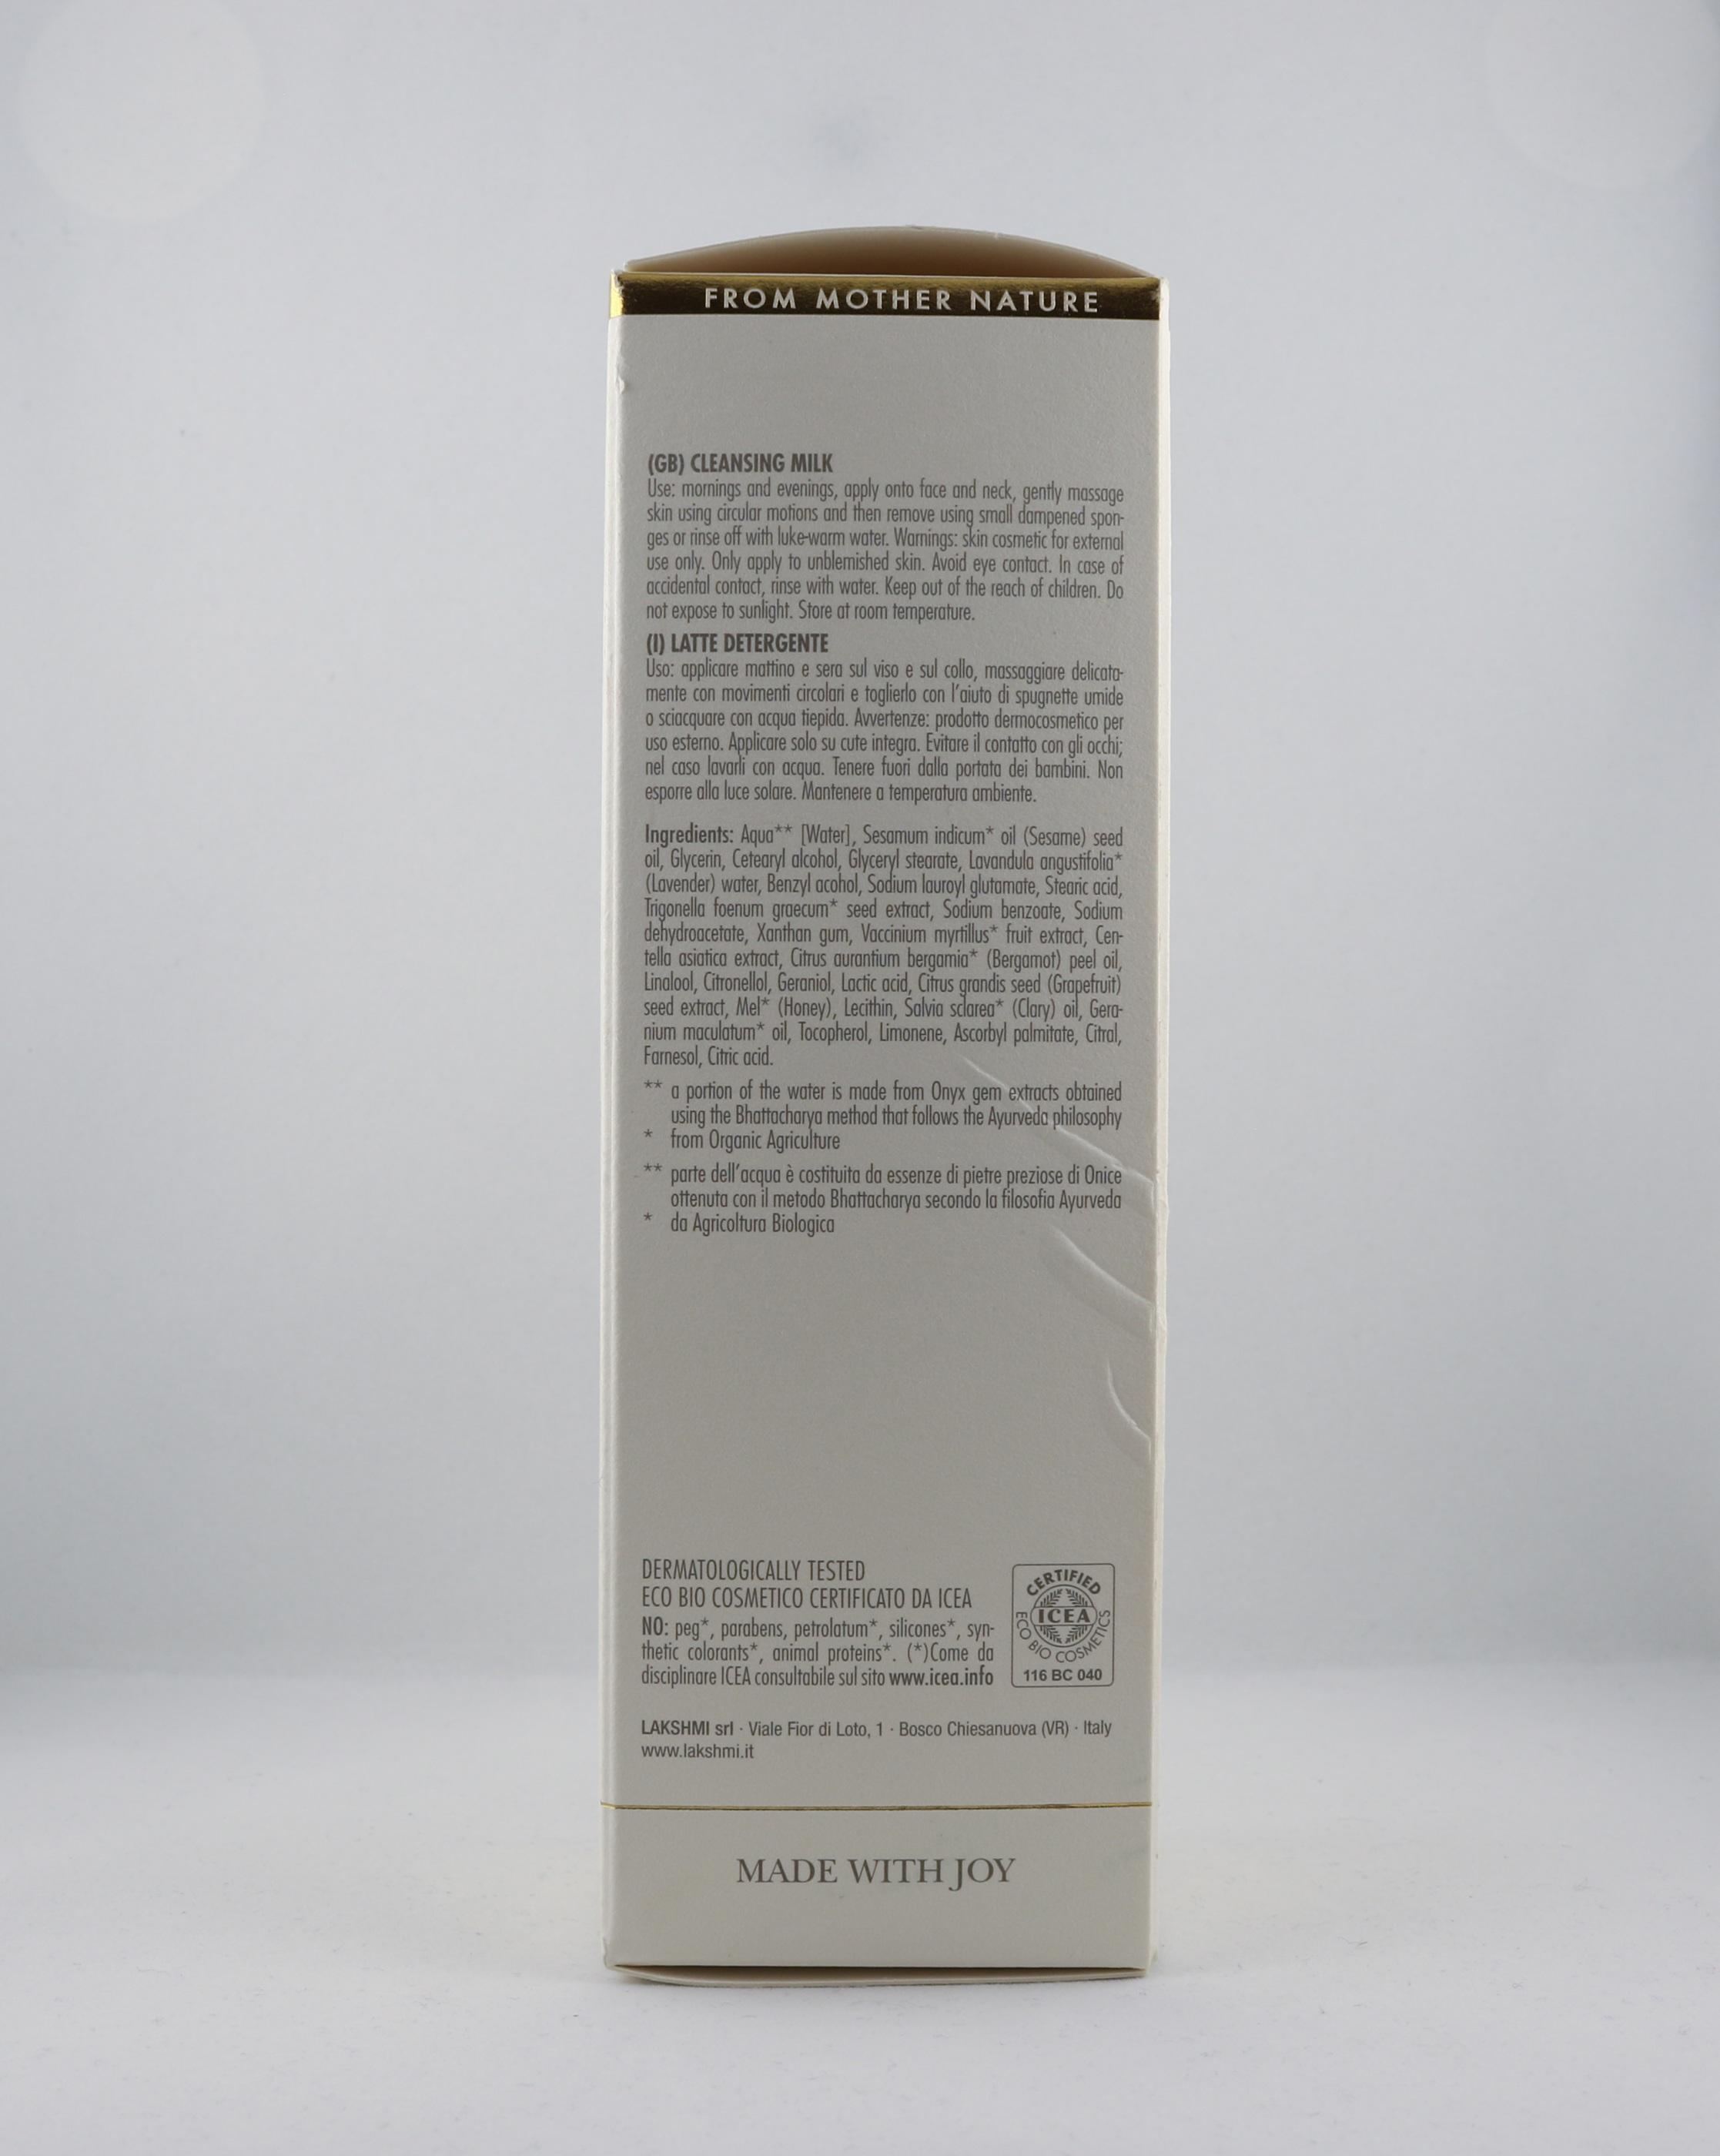 Anti-Age Face Cleansing Milk hudvårdsprodukt hudvårdstyp alternativ hälsa wellness ayurveda hudvårdsprodukter